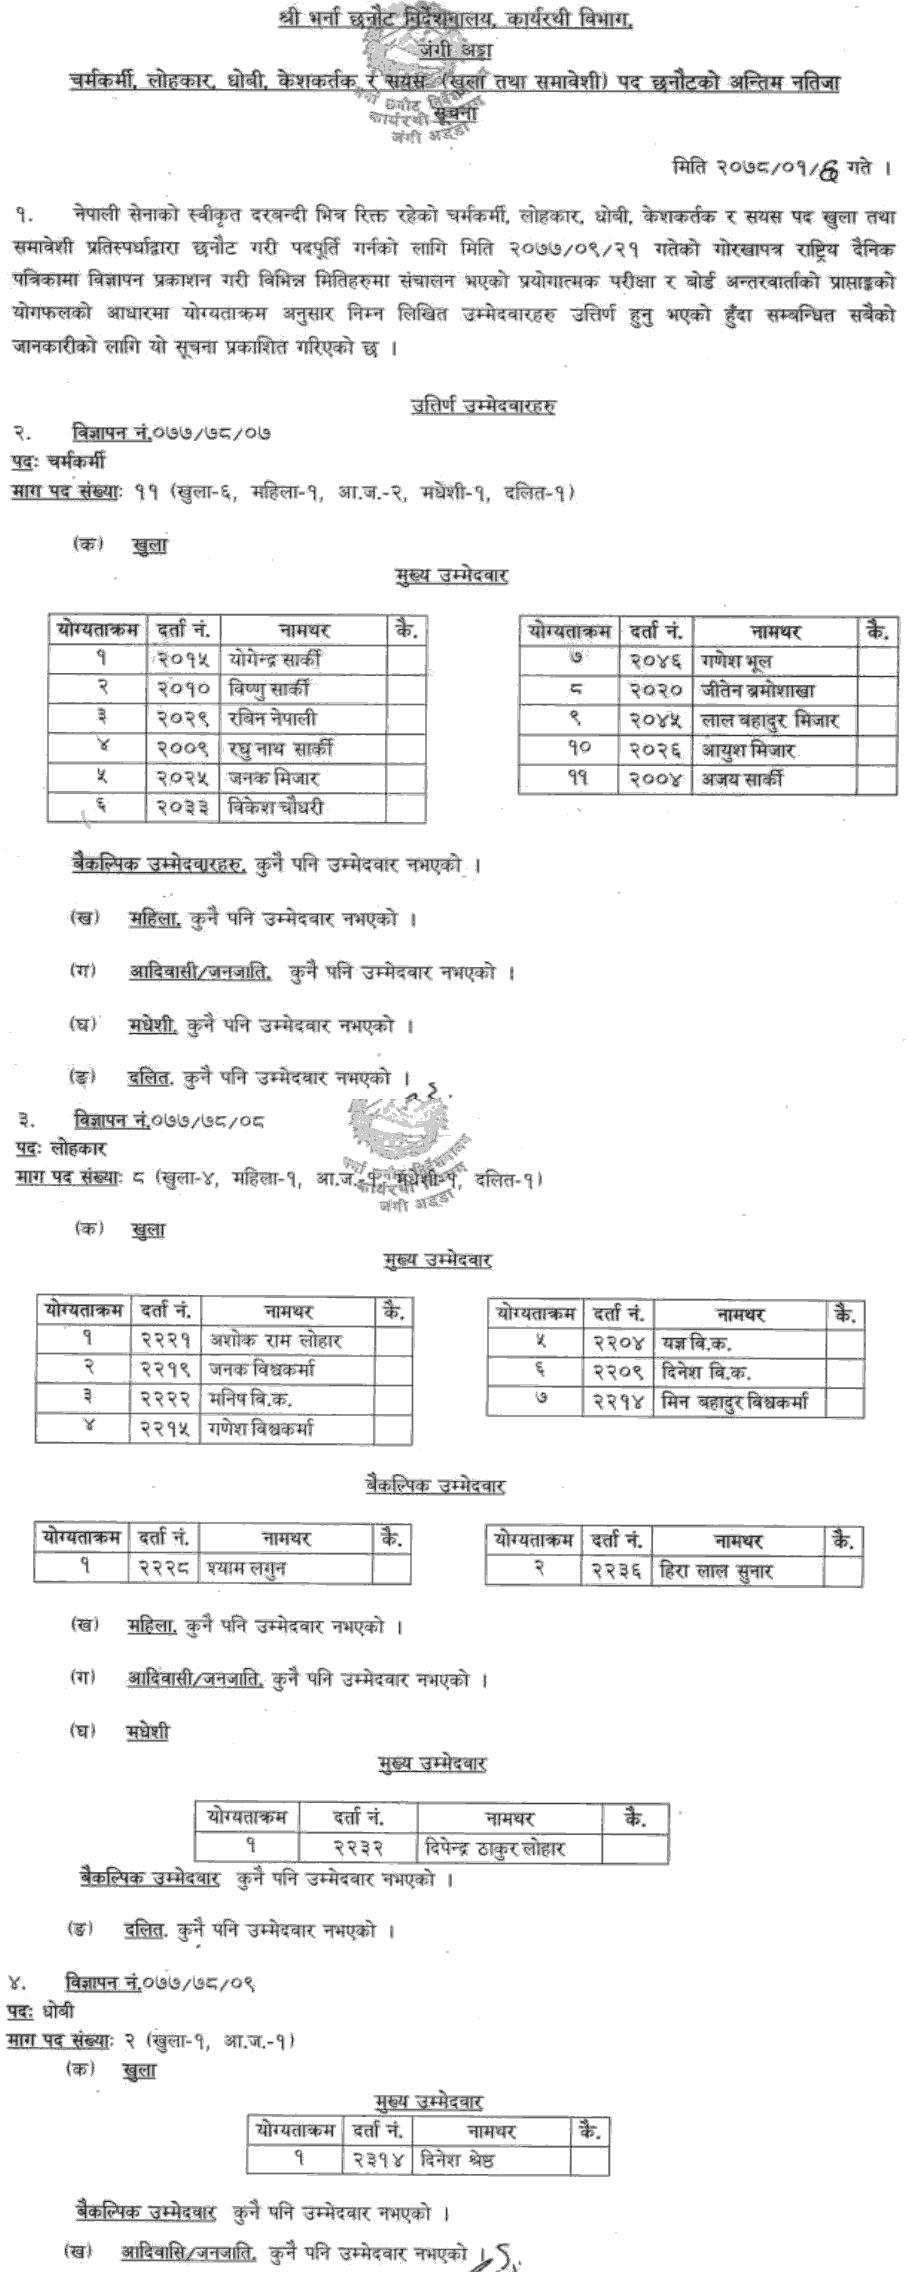 Nepal Army Published Final Result of Charmakarmi, Lohakar, Dhobi, Keshakartak, Sayes Post